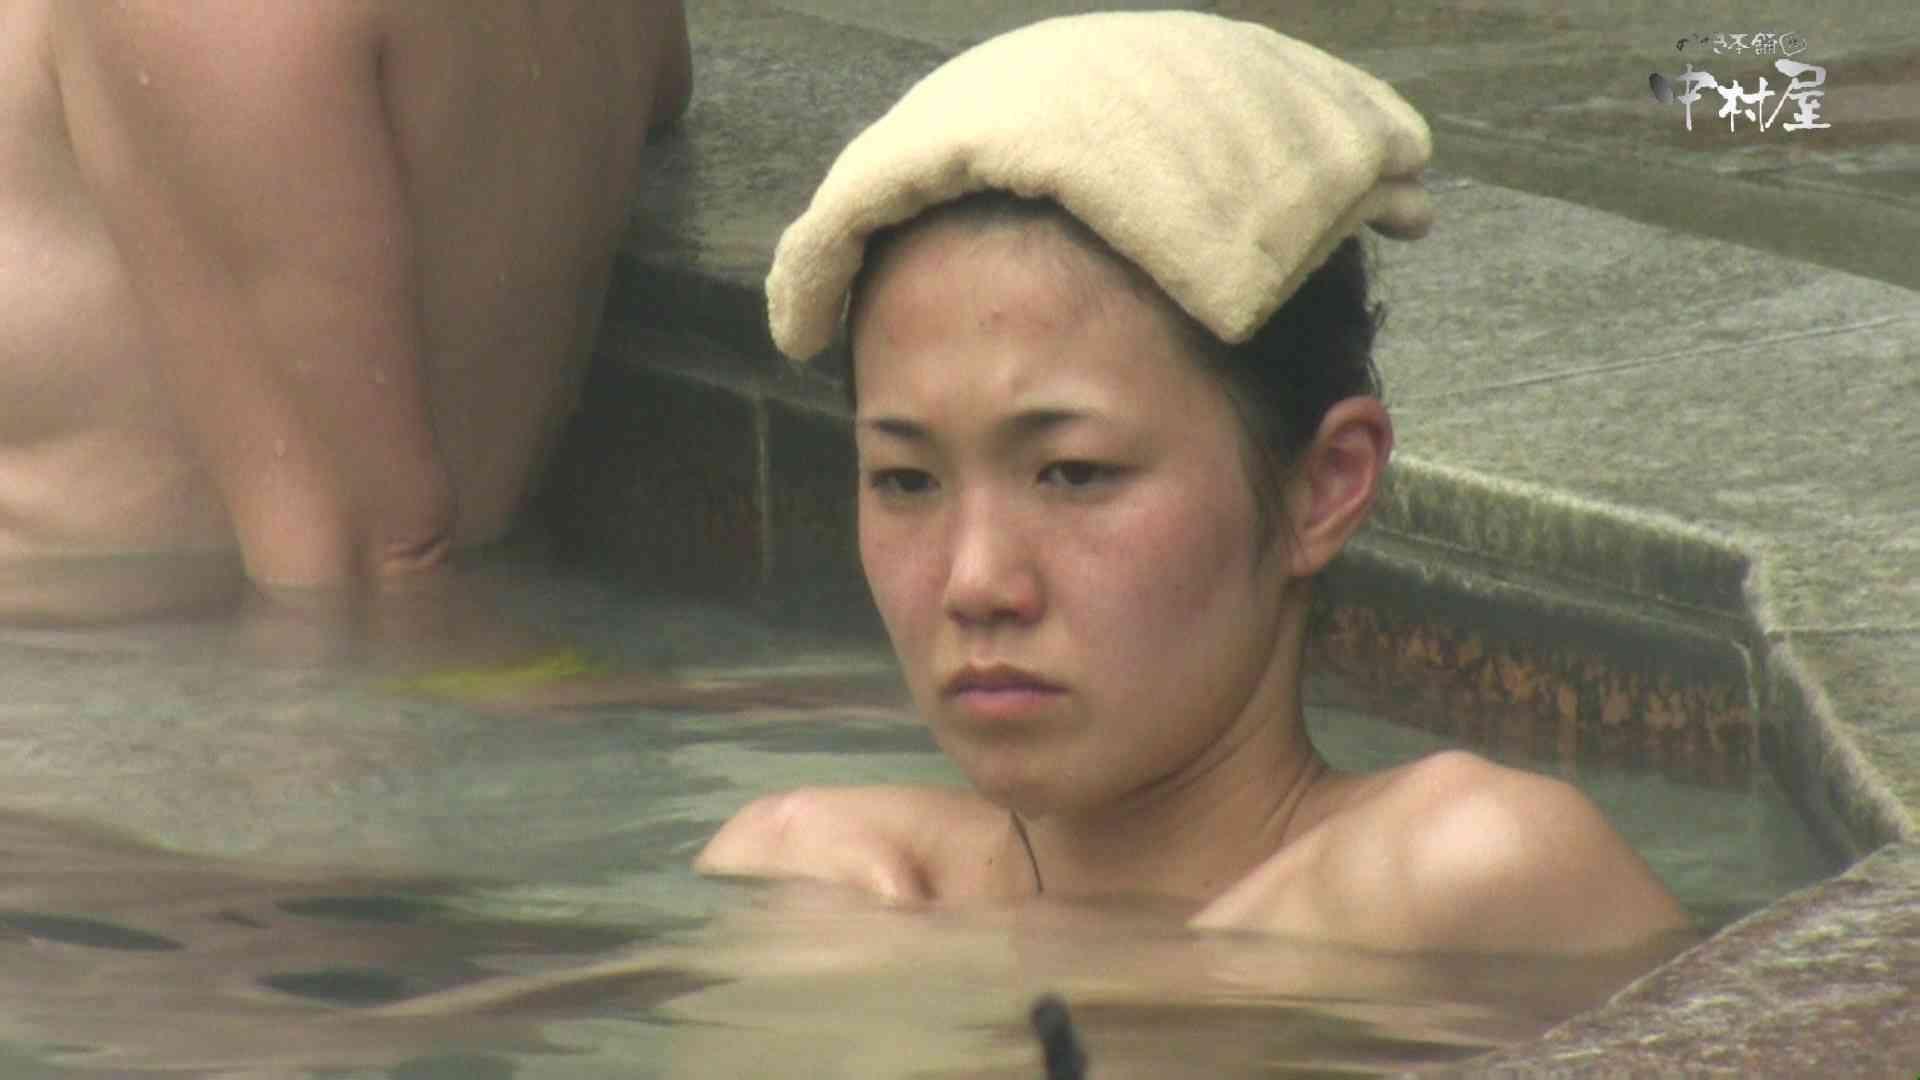 Aquaな露天風呂Vol.889 盗撮シリーズ | 露天風呂編  89PIX 65